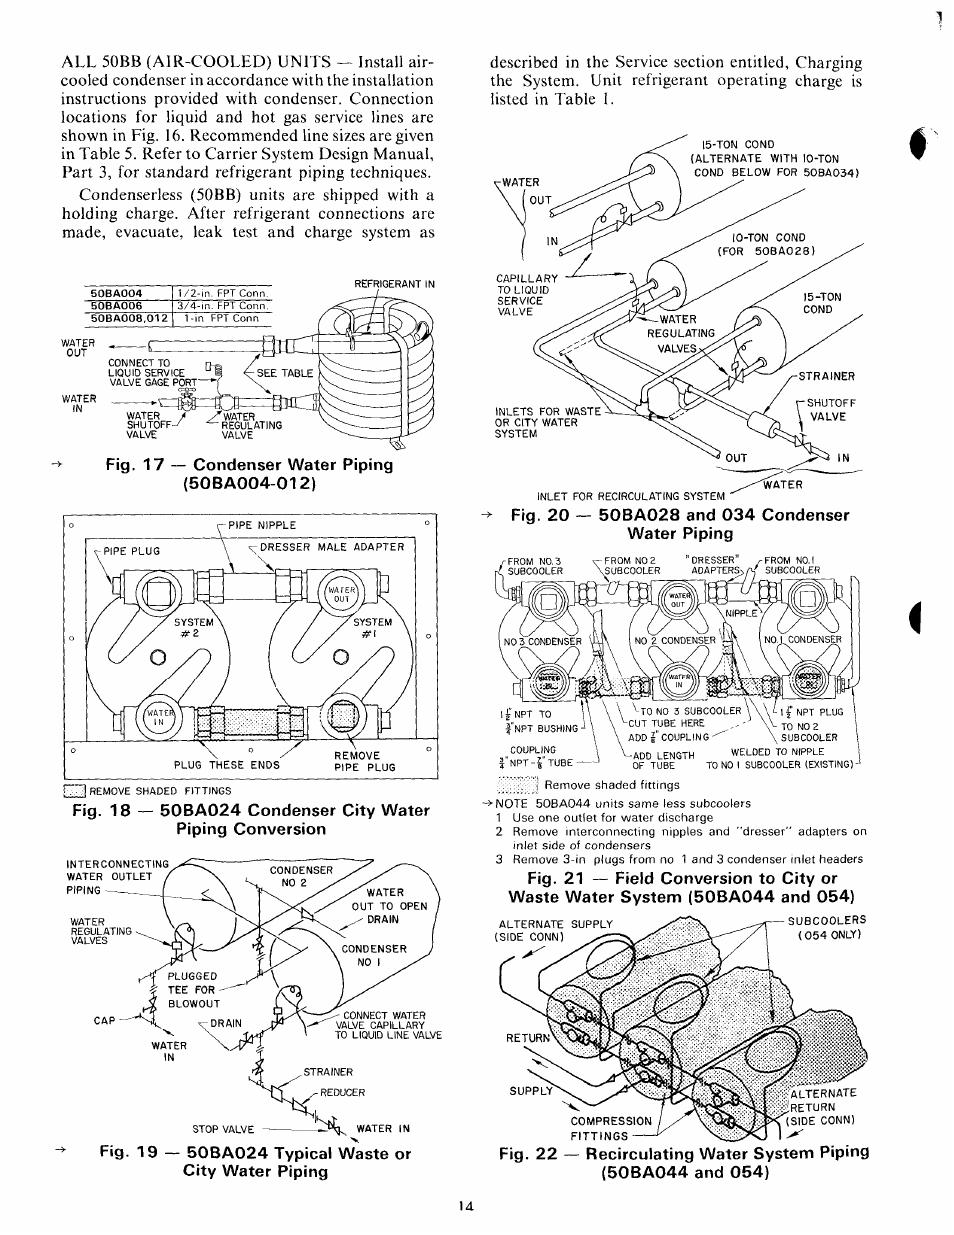 water piping carrier 50ba user manual page 14 24 original mode rh manualsdir com Carrier Technical Manuals carrier piping design manual pdf